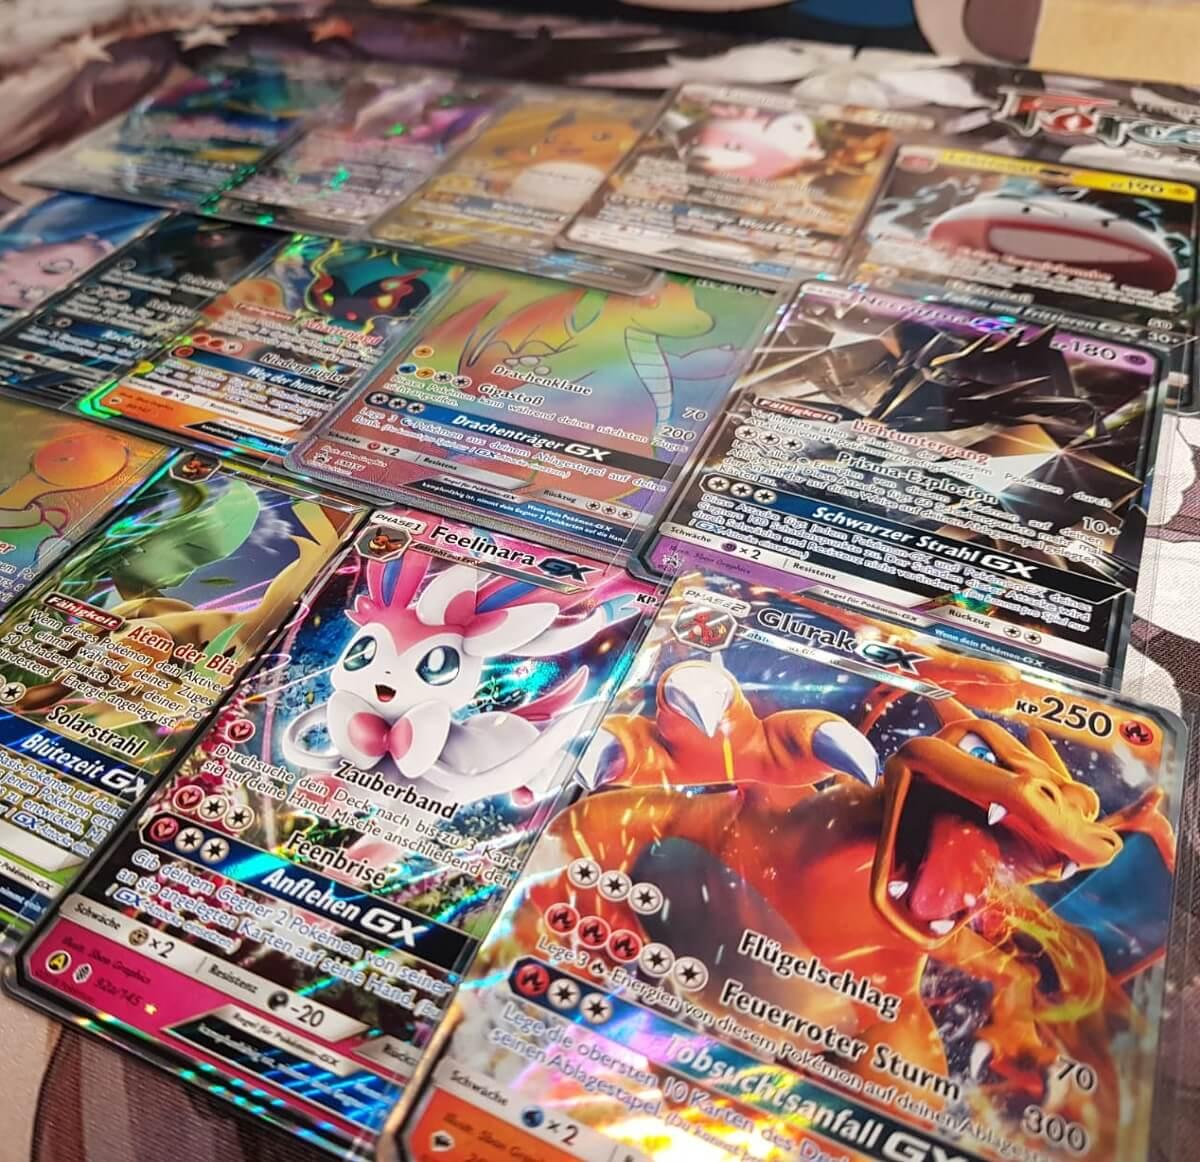 Pokemonkarten